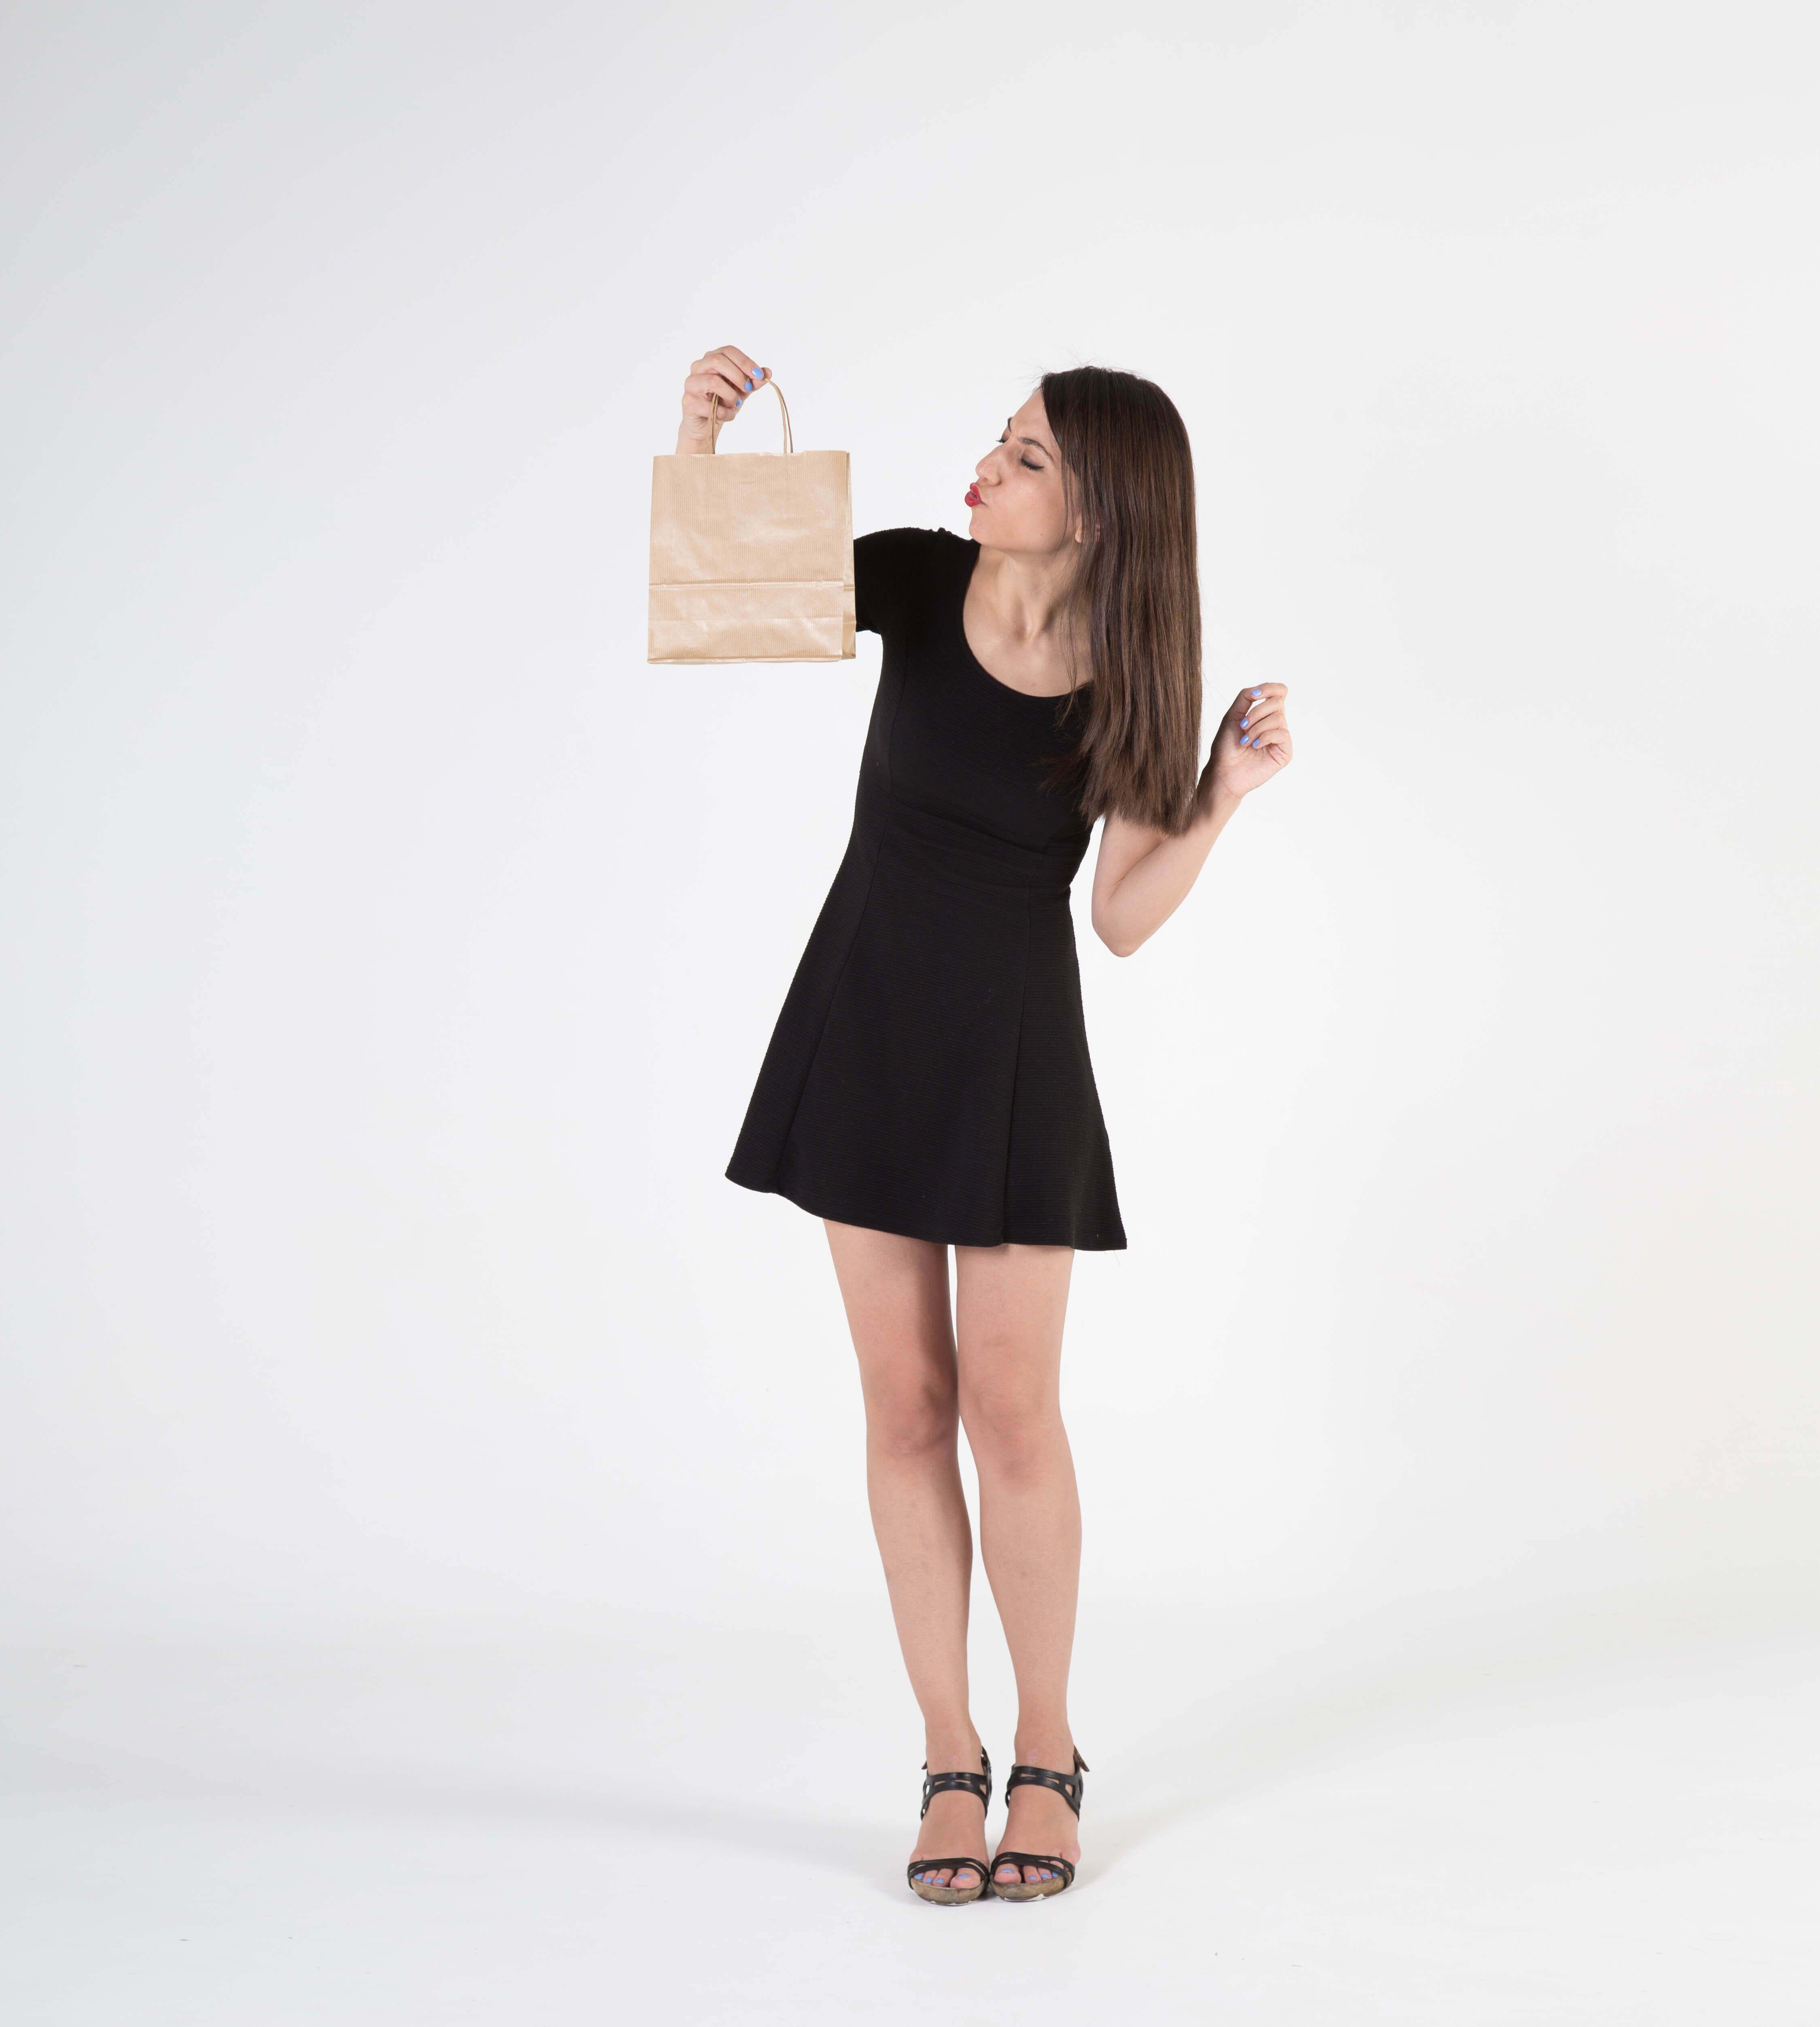 Foto de Bolsas de papel, biodegradables y reutilizables